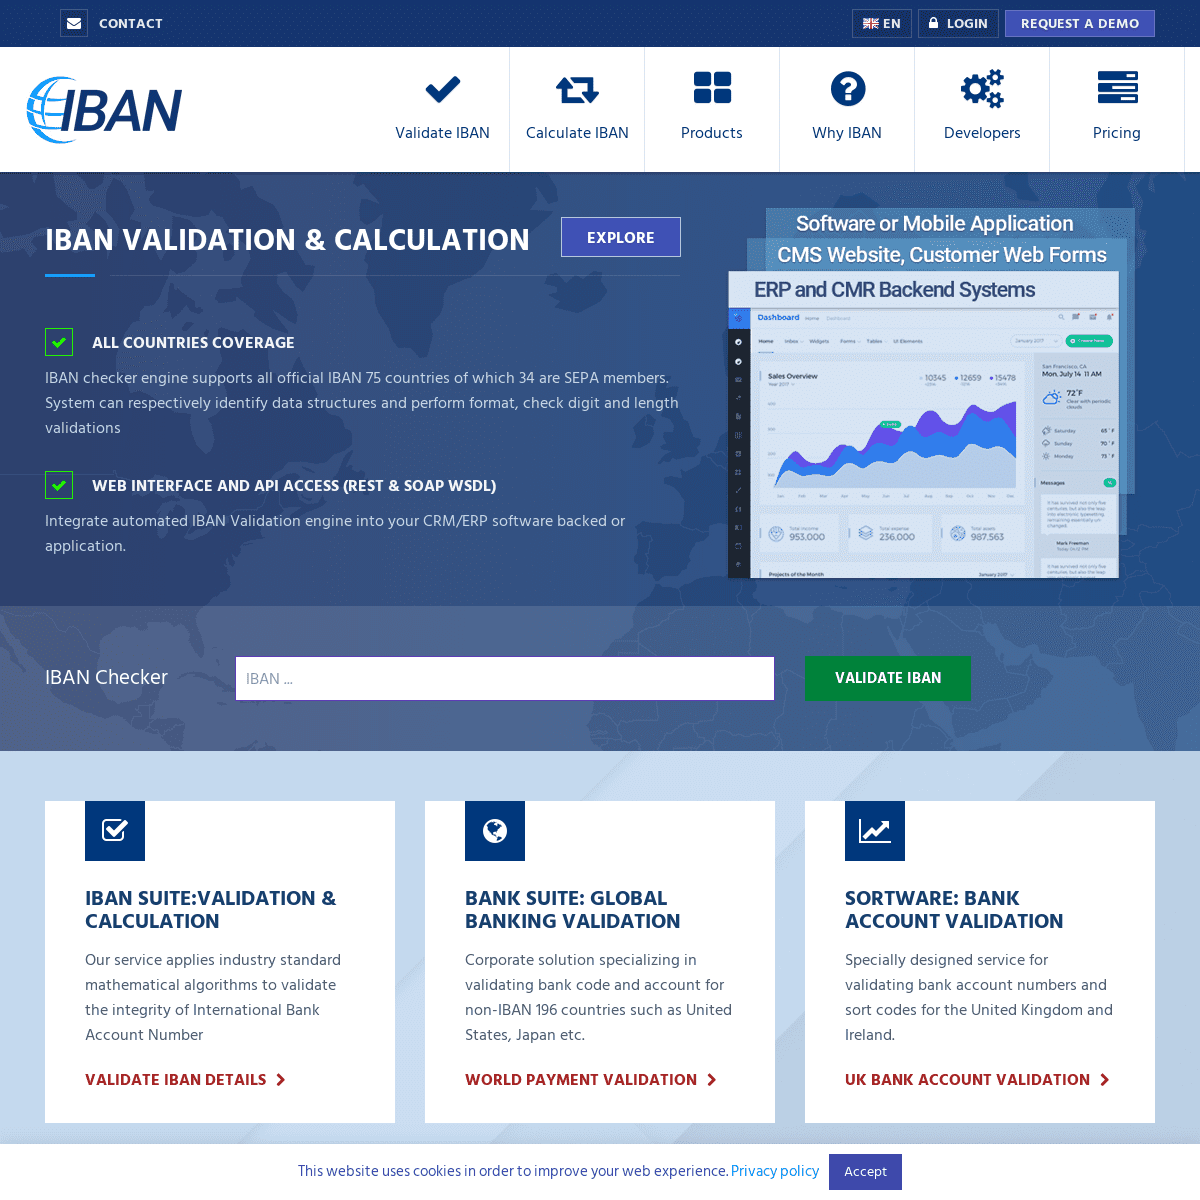 IBAN Checker- International Bank Account Number validation